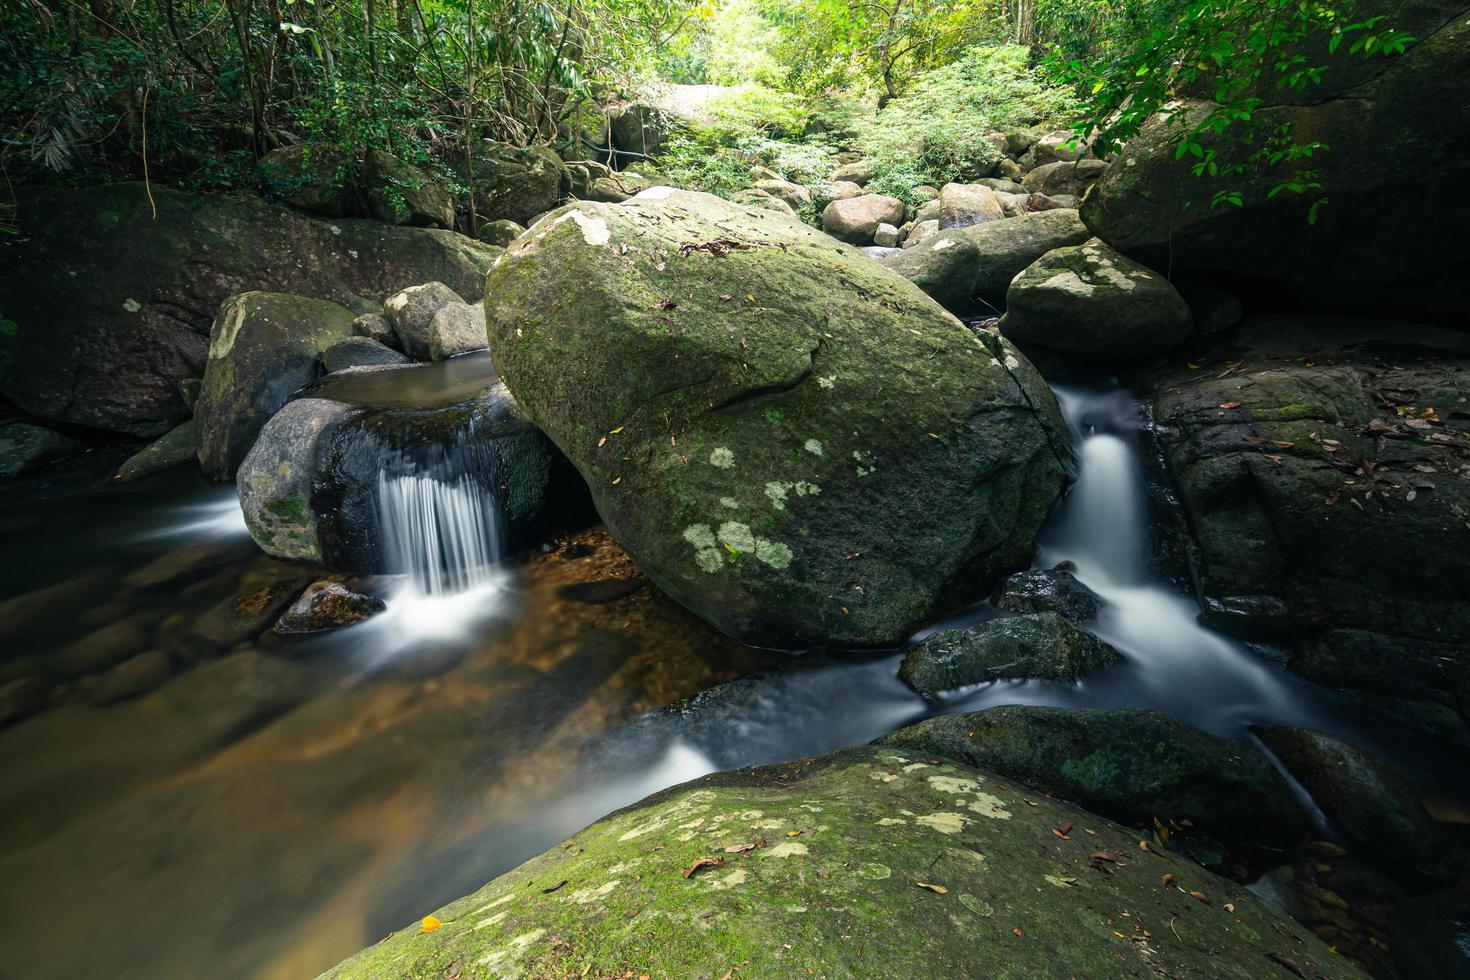 khlong pla kang watervallen in thailand. foto